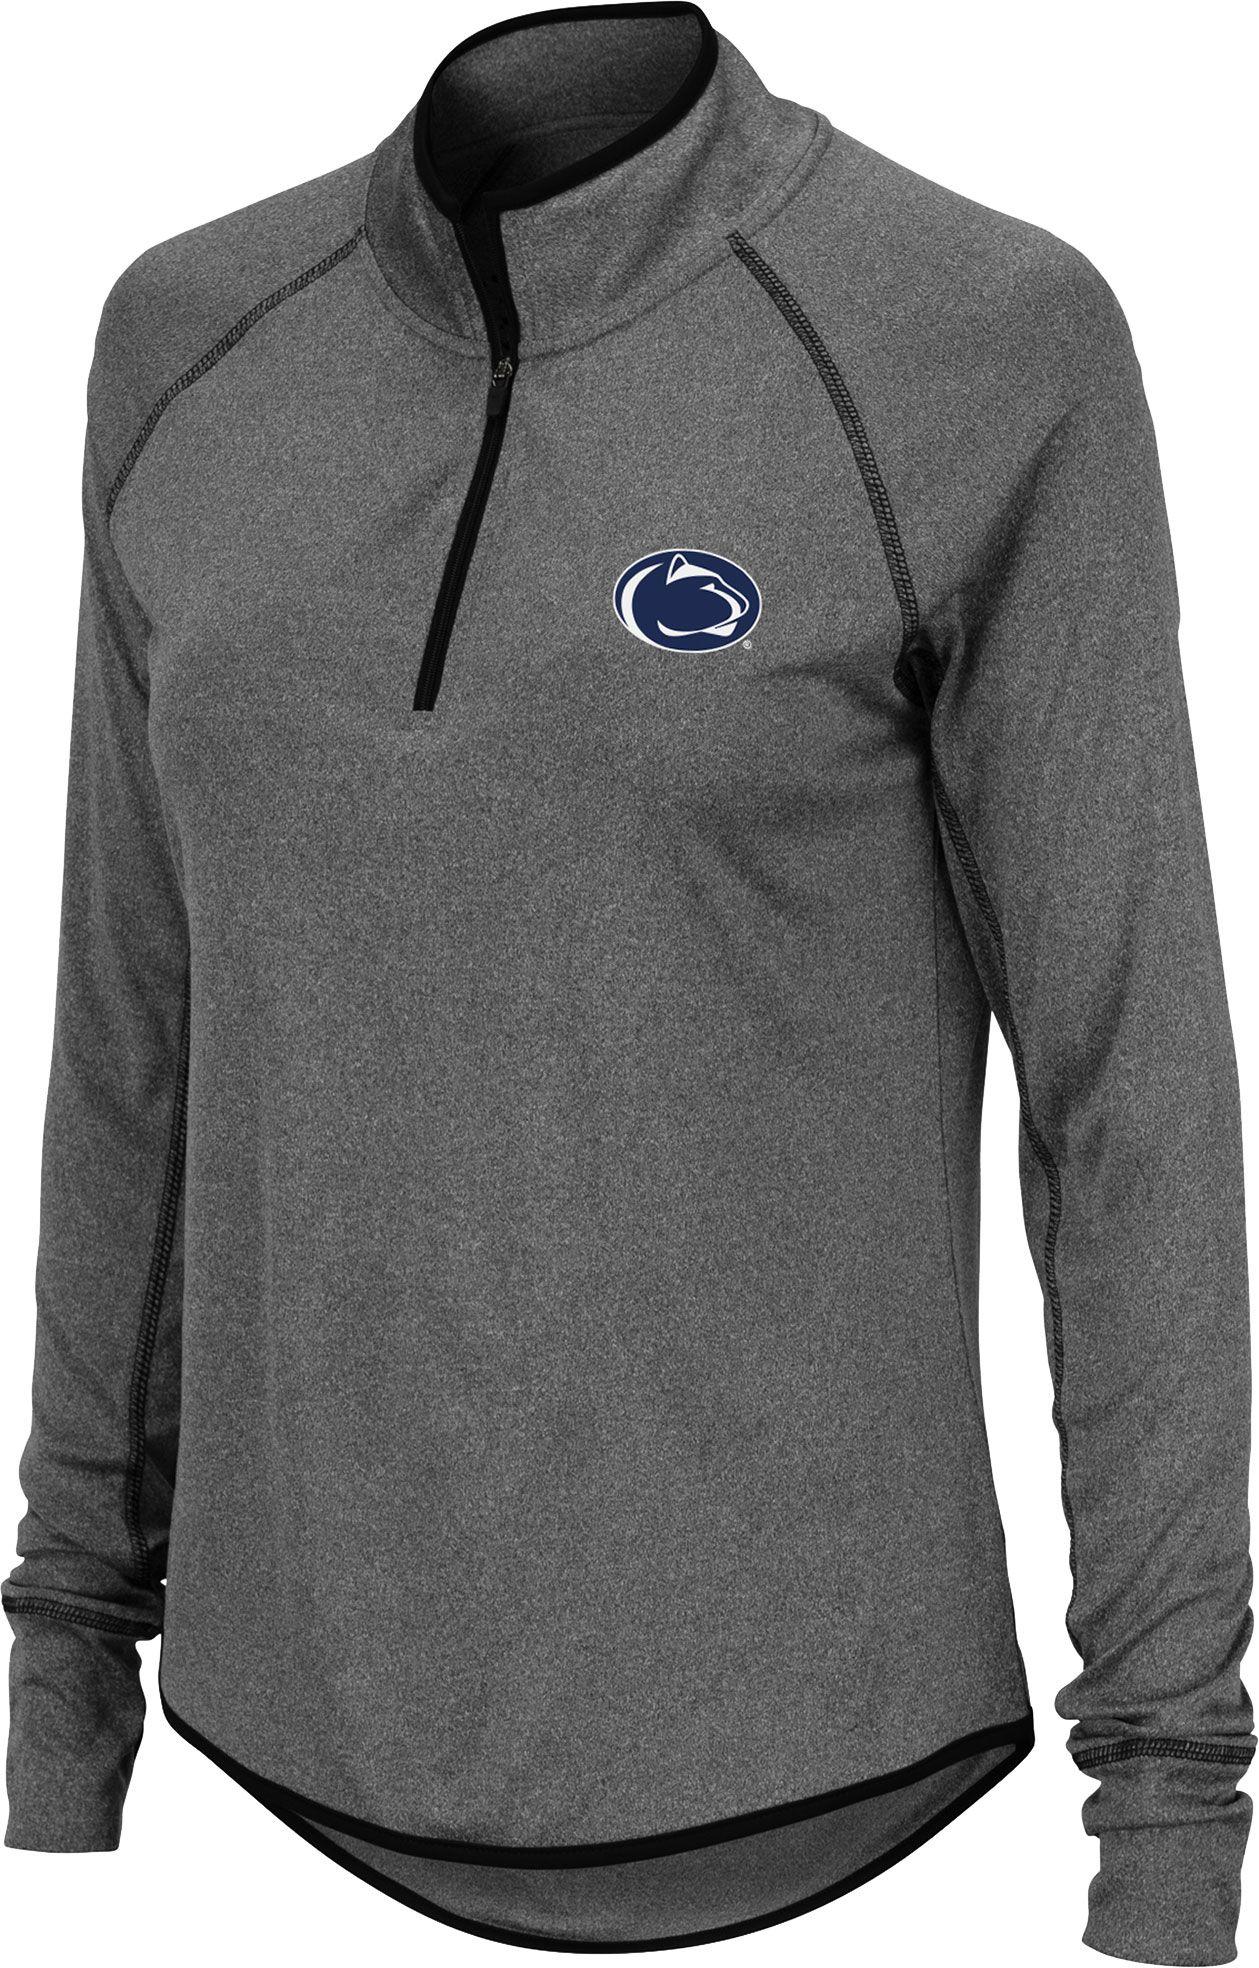 Colosseum Womens Penn State Nittany Lions Grey Quarter Zip Shirt